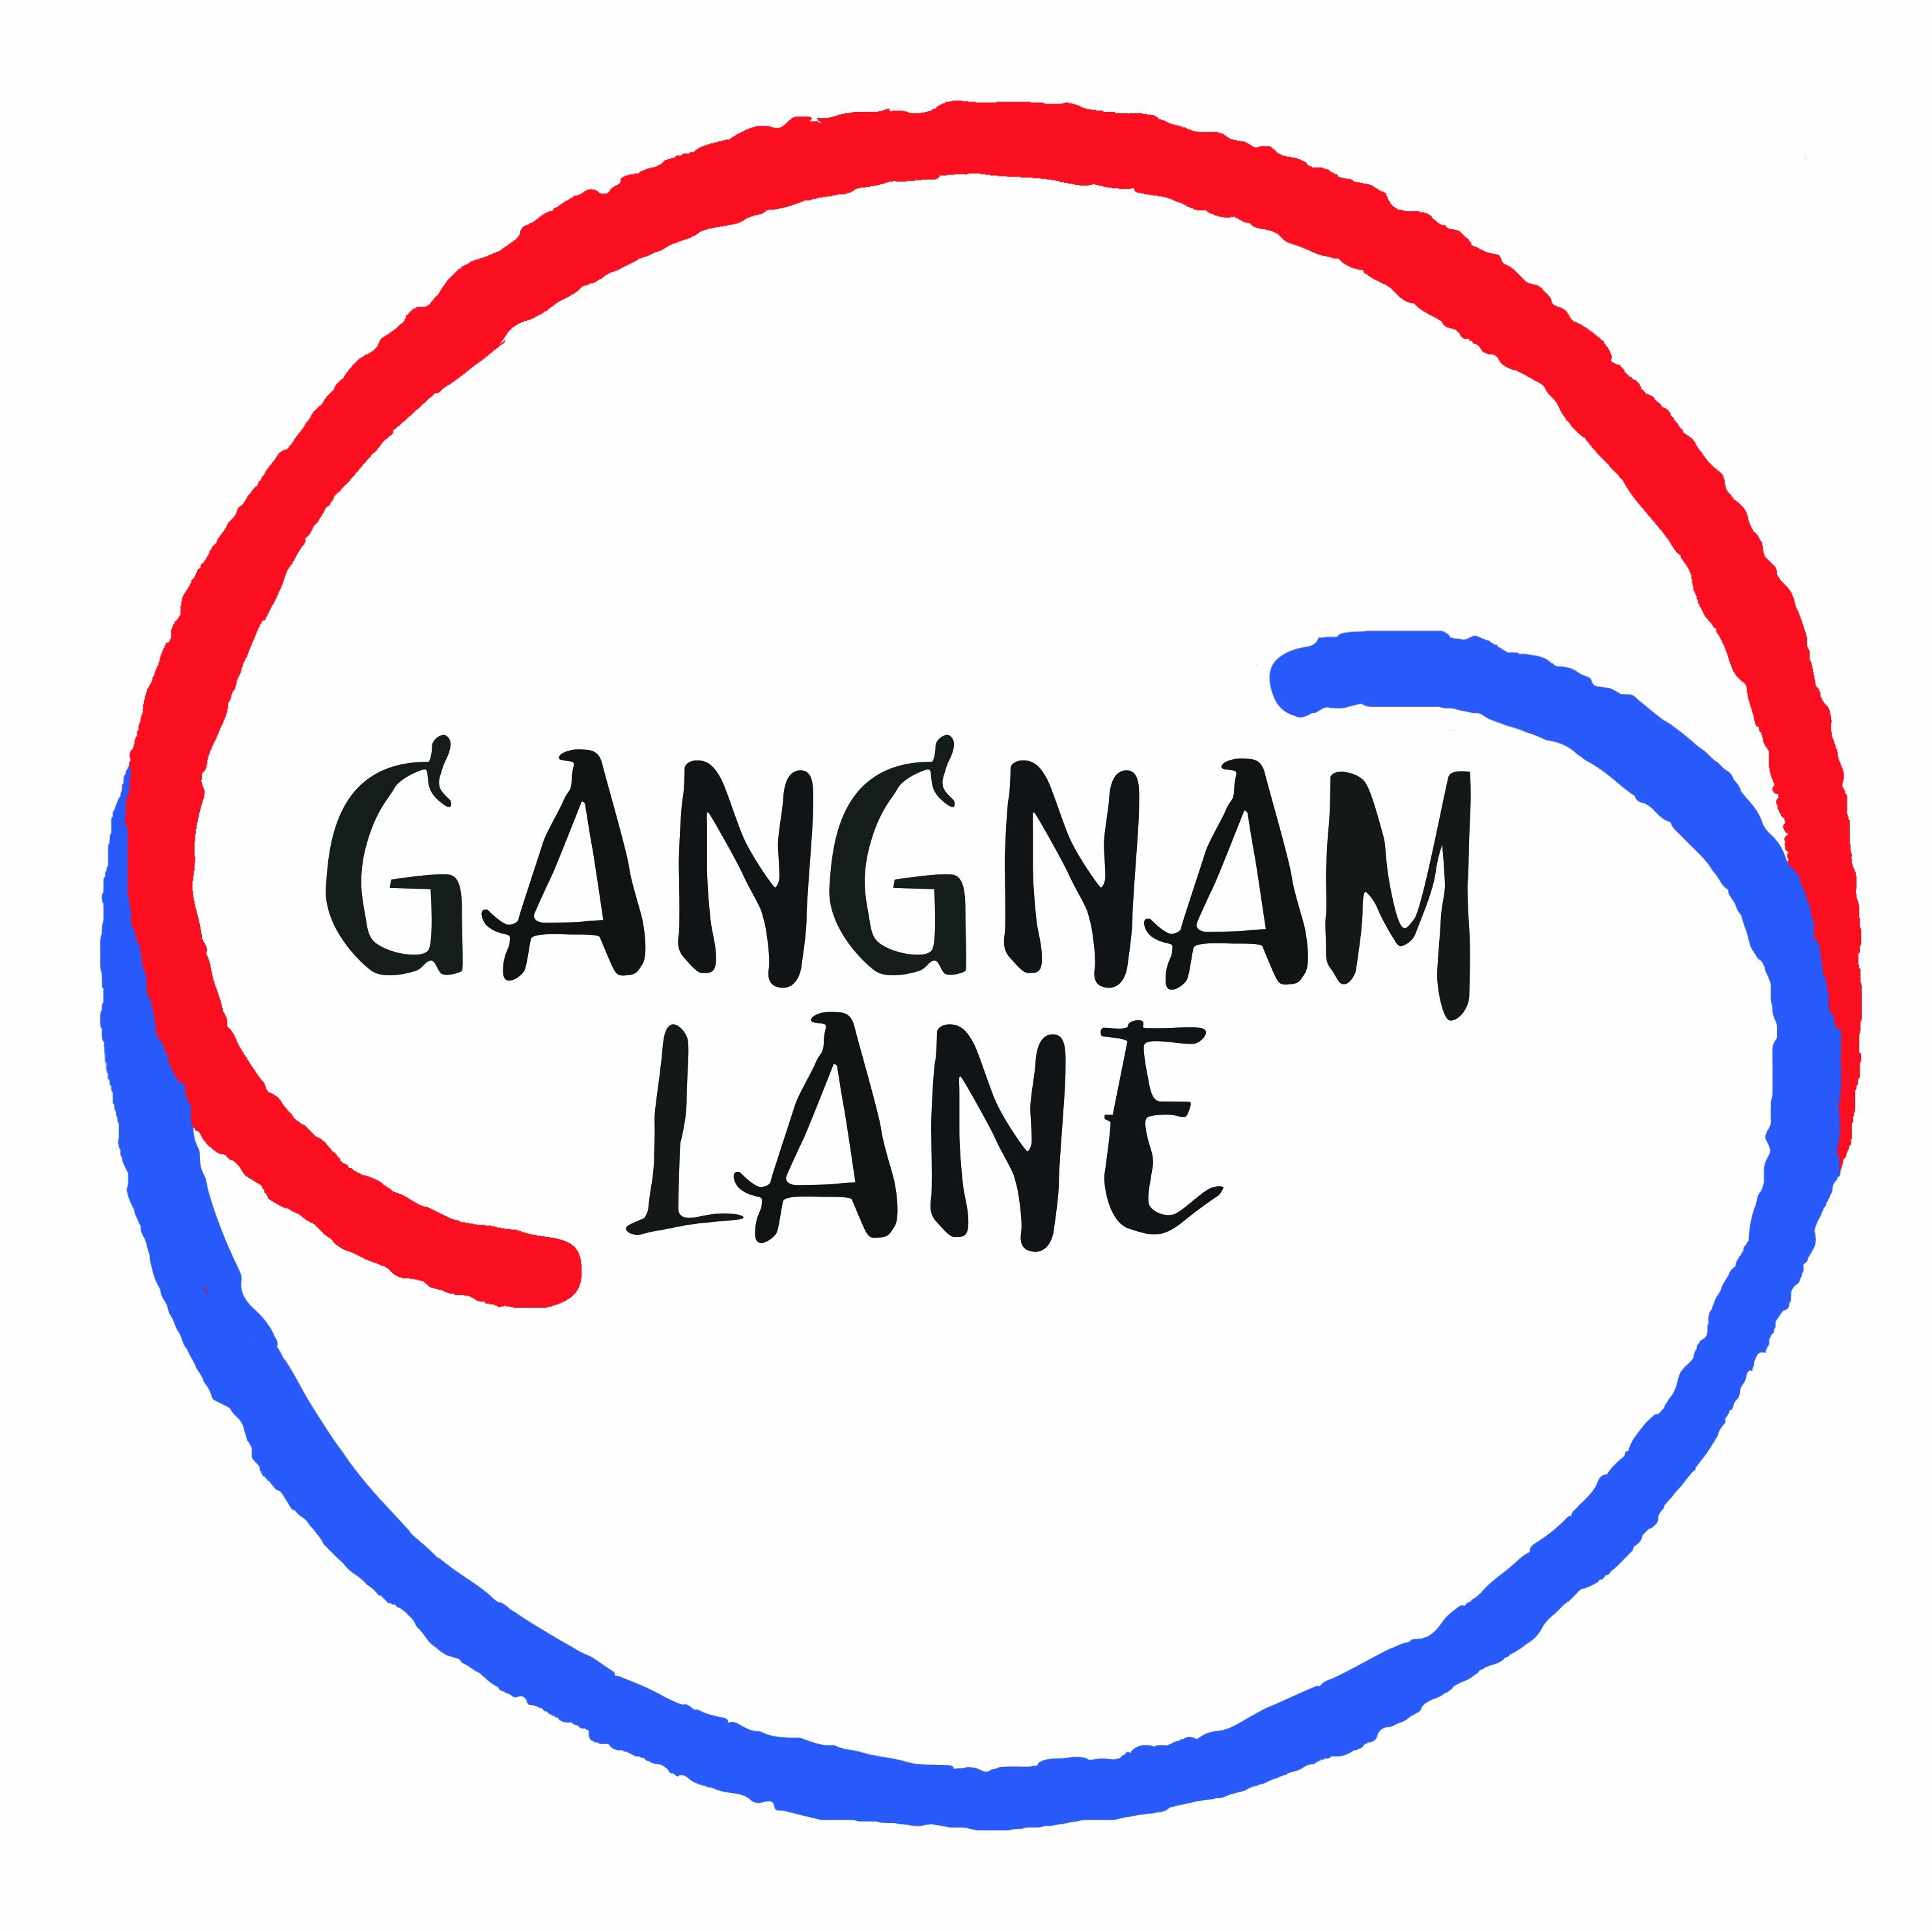 Gangnam Lane